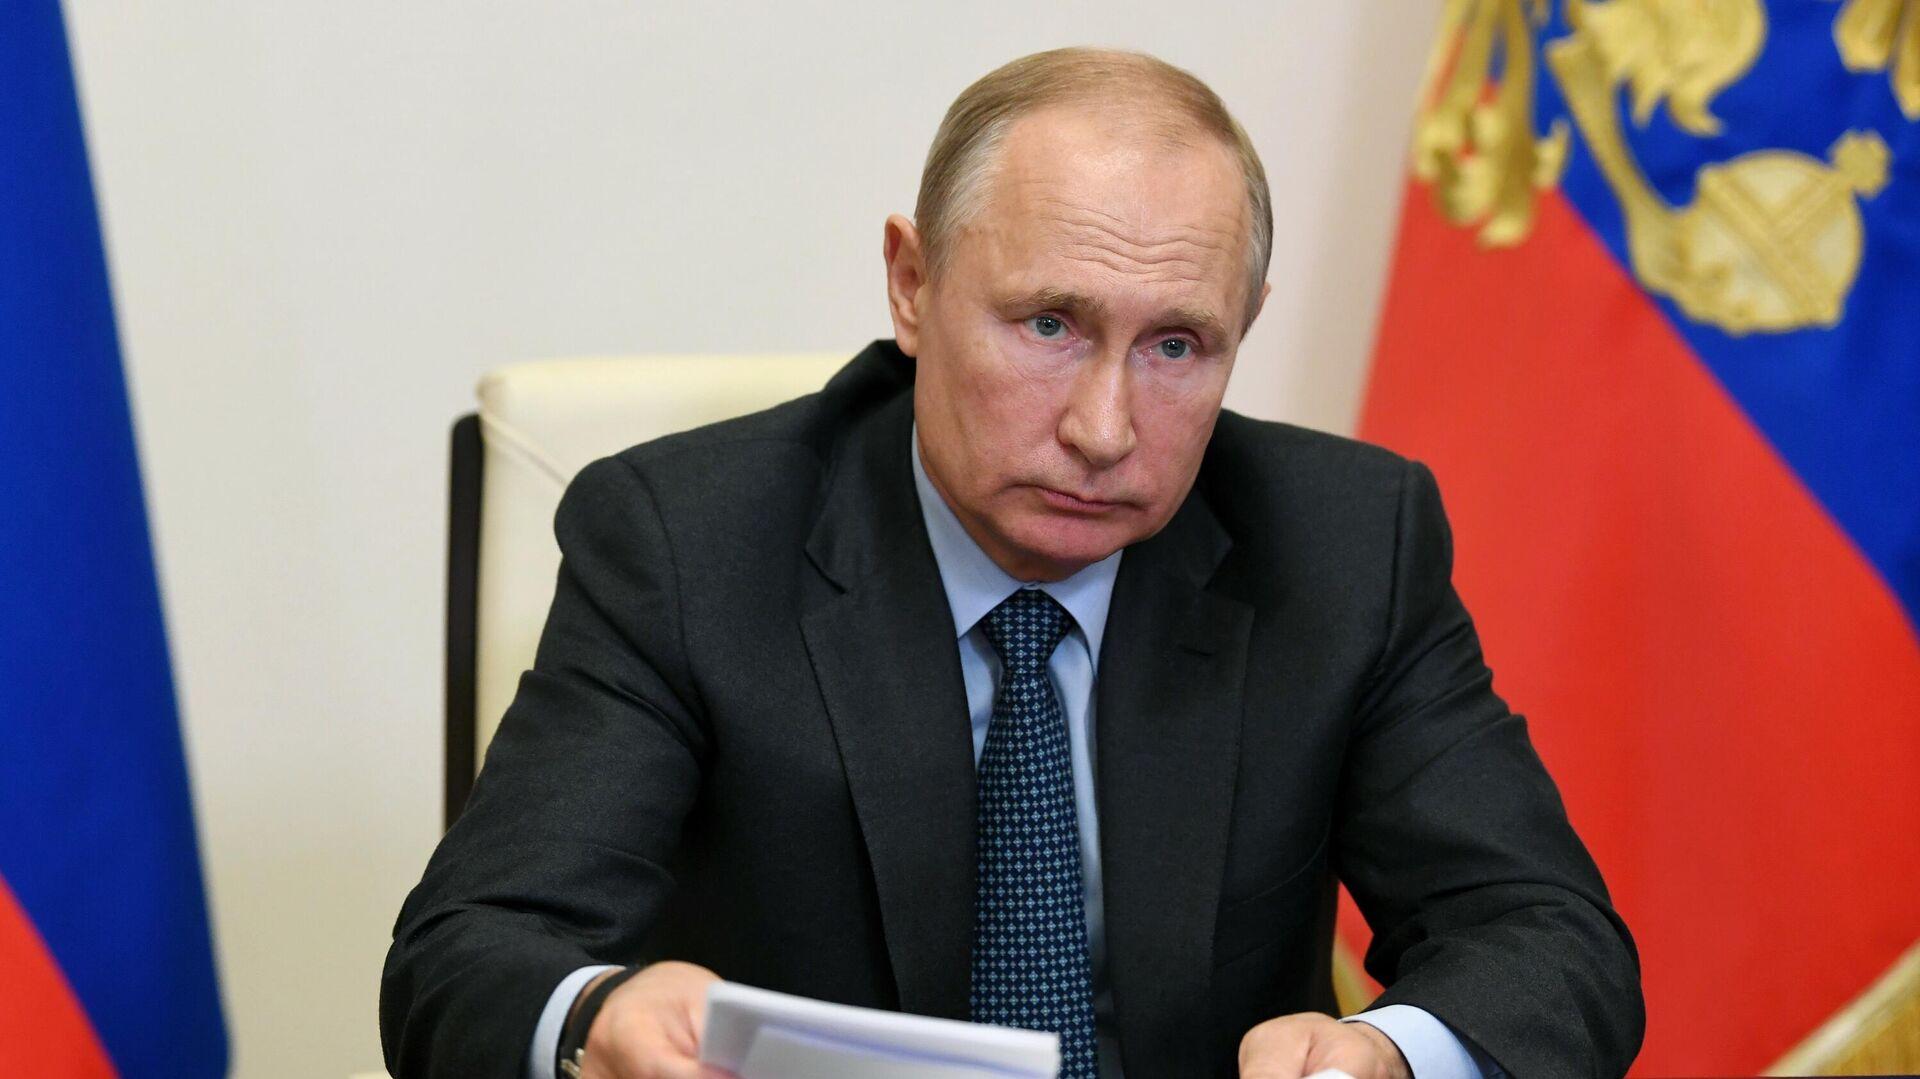 Президент РФ Владимир Путин - РИА Новости, 1920, 18.06.2020